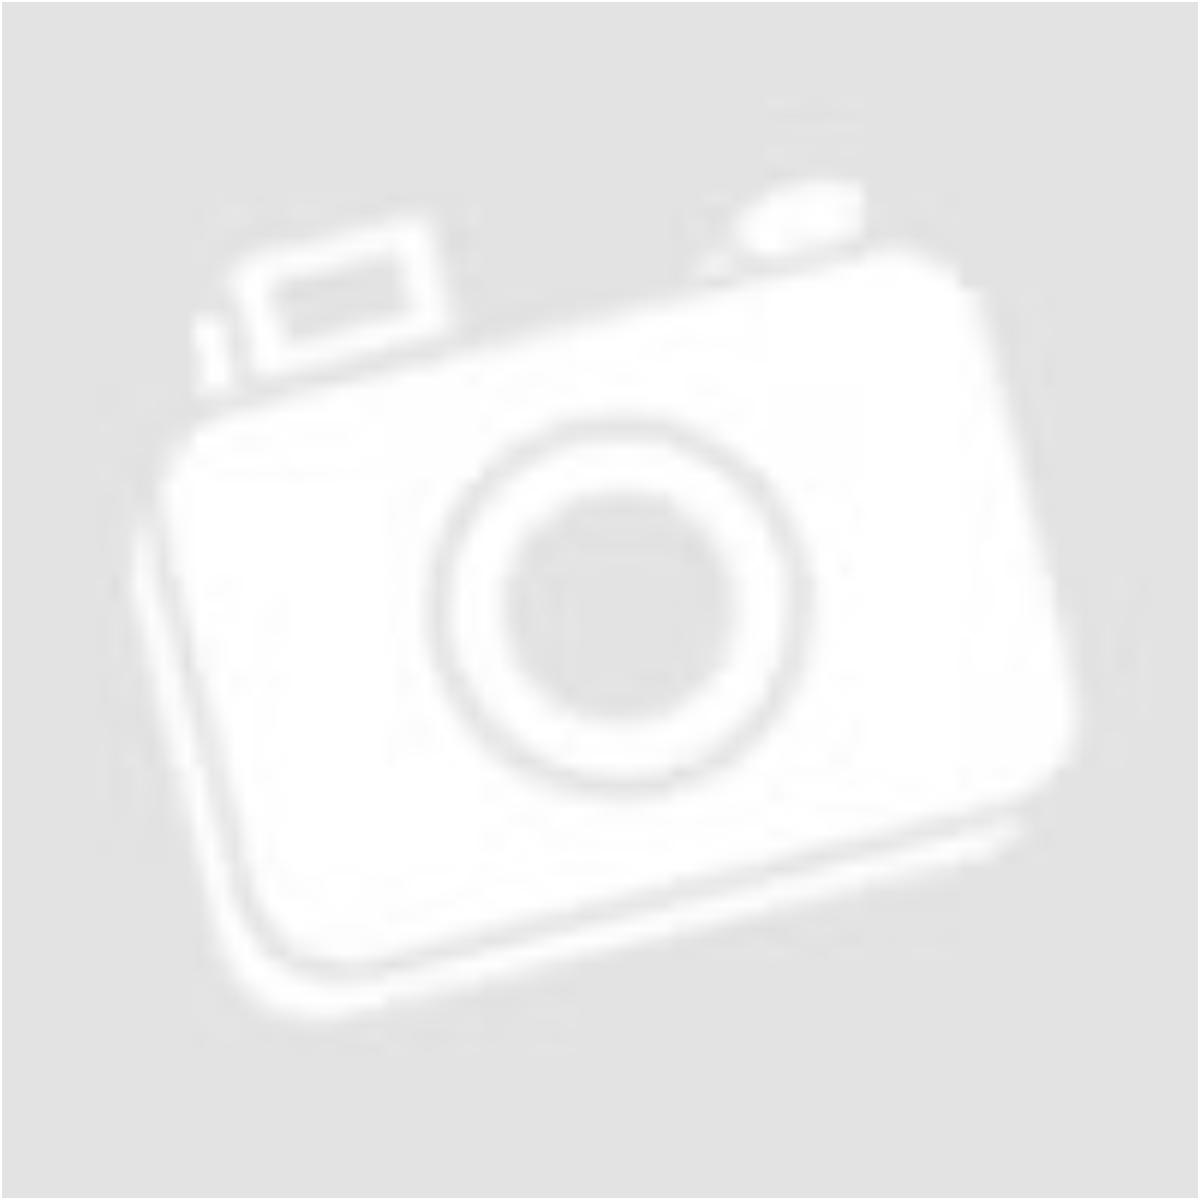 BIANCHI INFINITO XE DISC - 105 11SP 50/34 (FULCRUM RACING) kerékpár